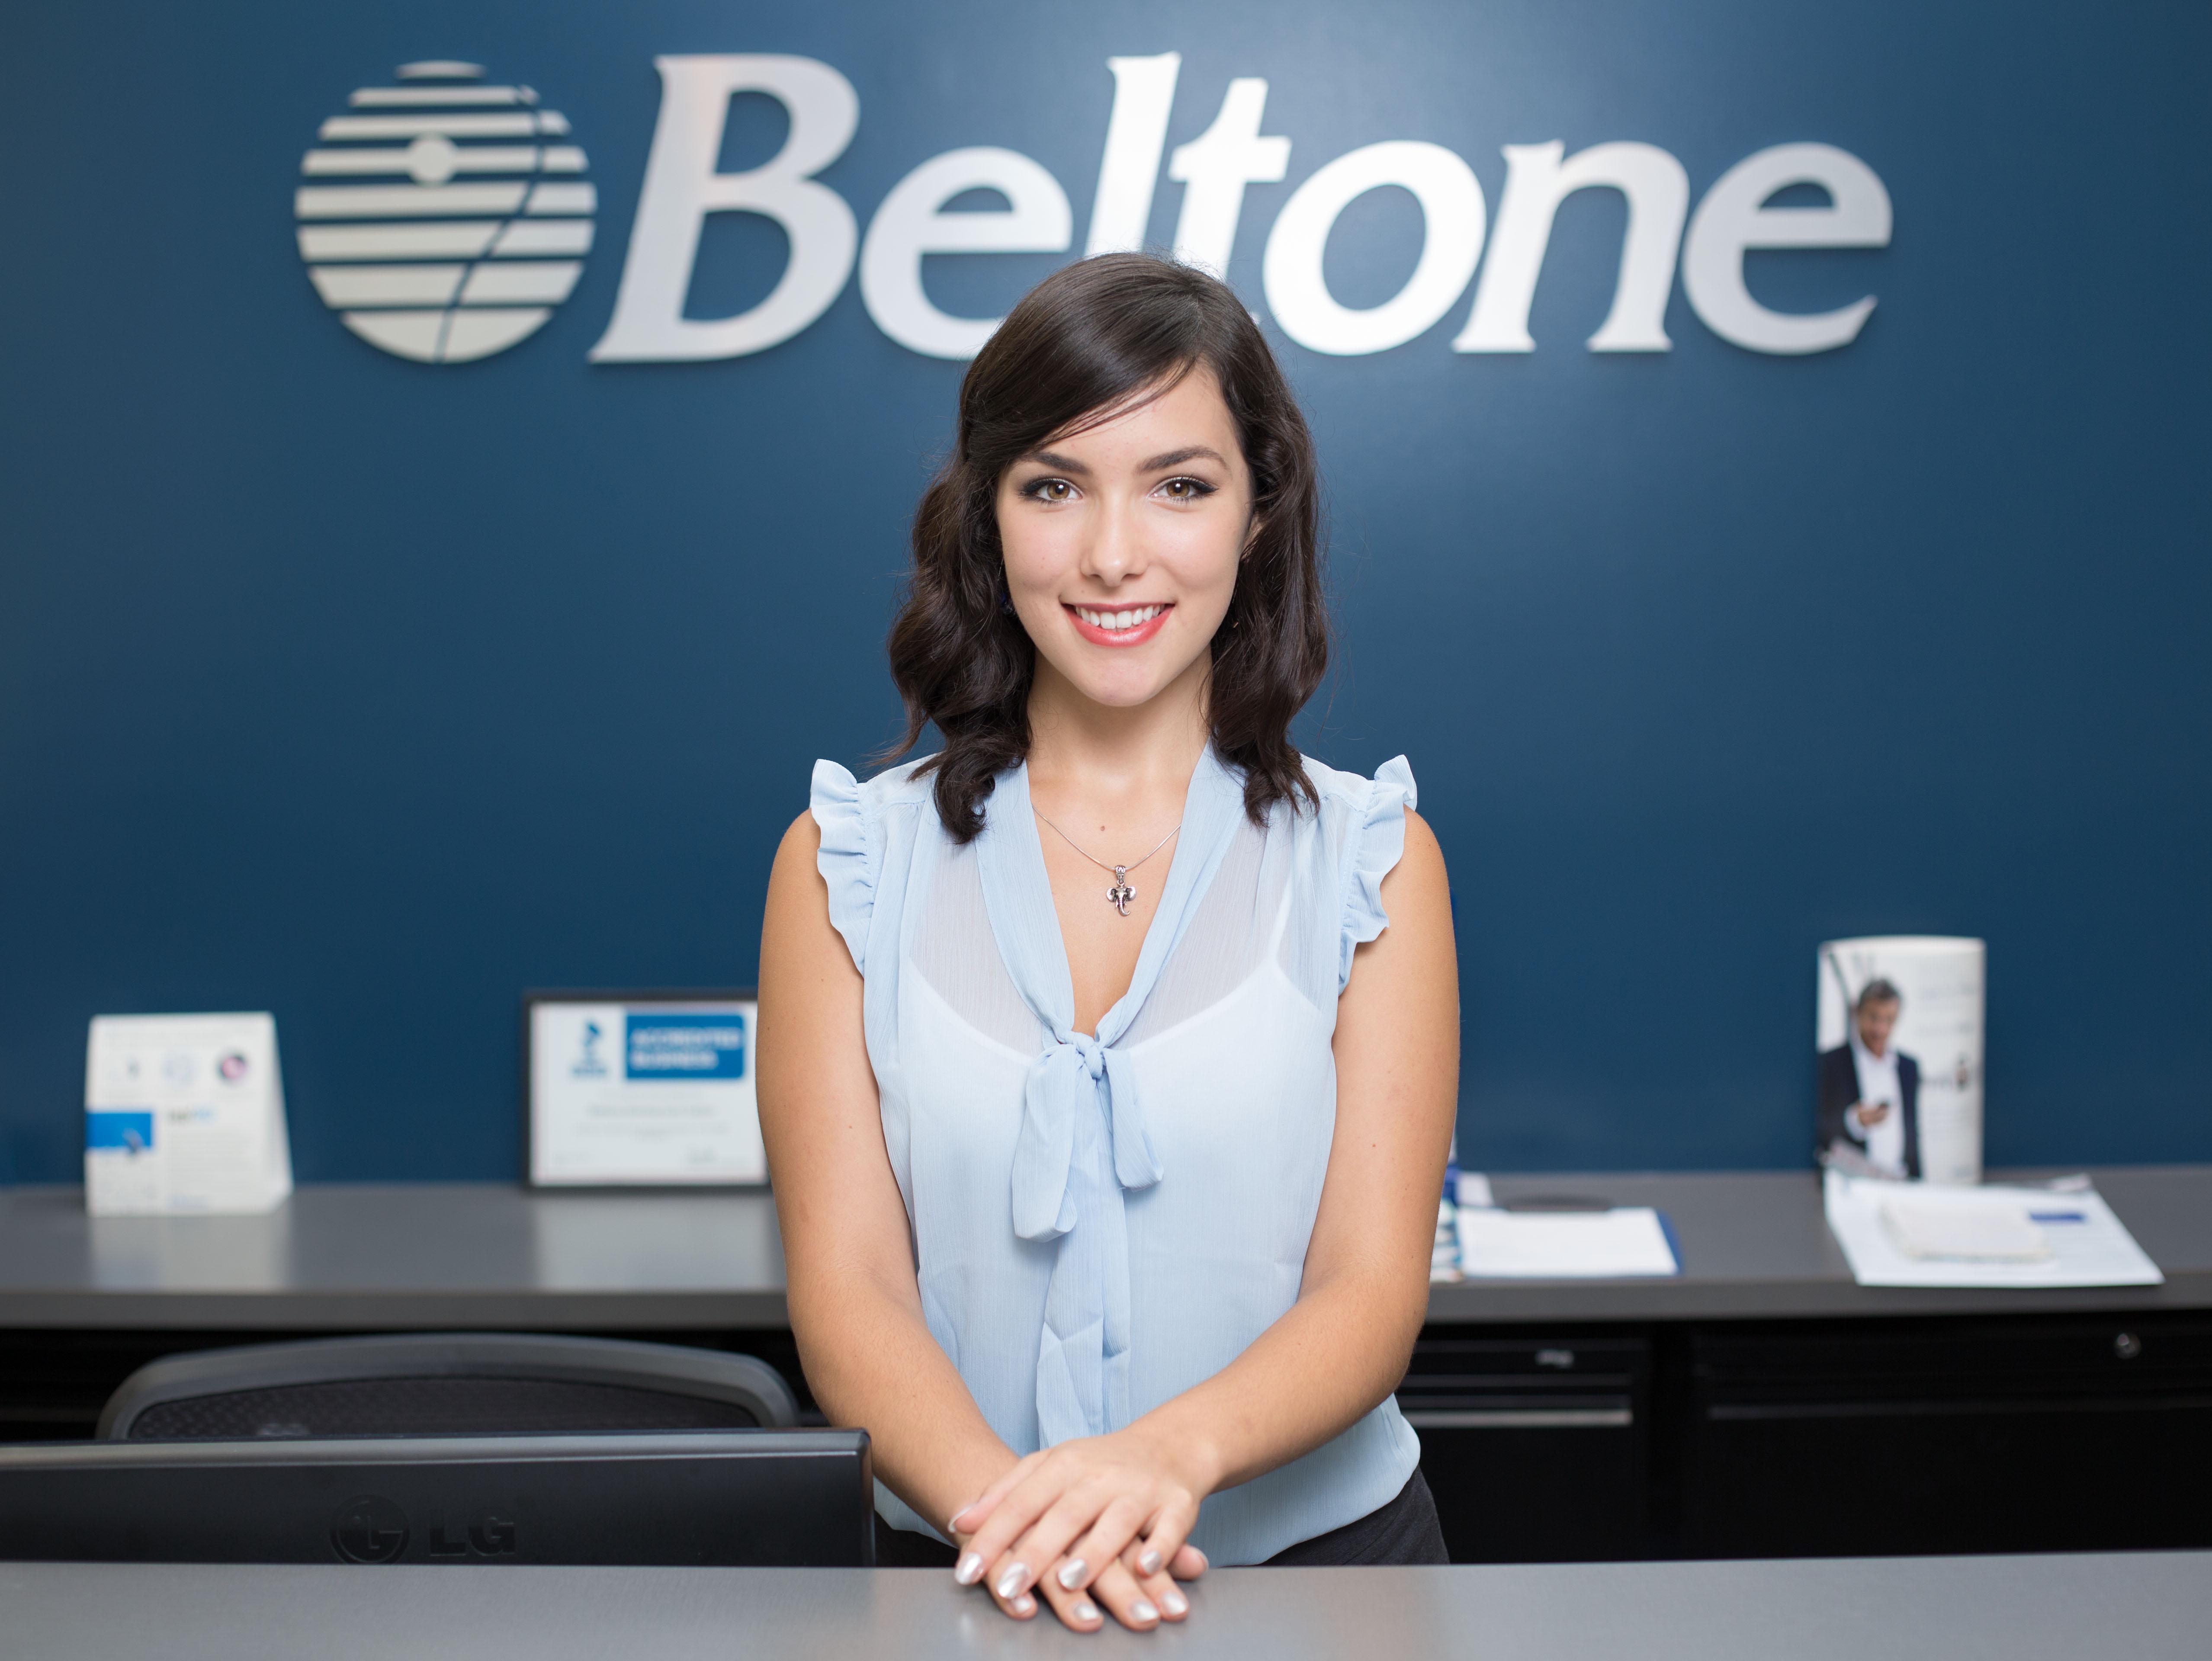 Island Beltone